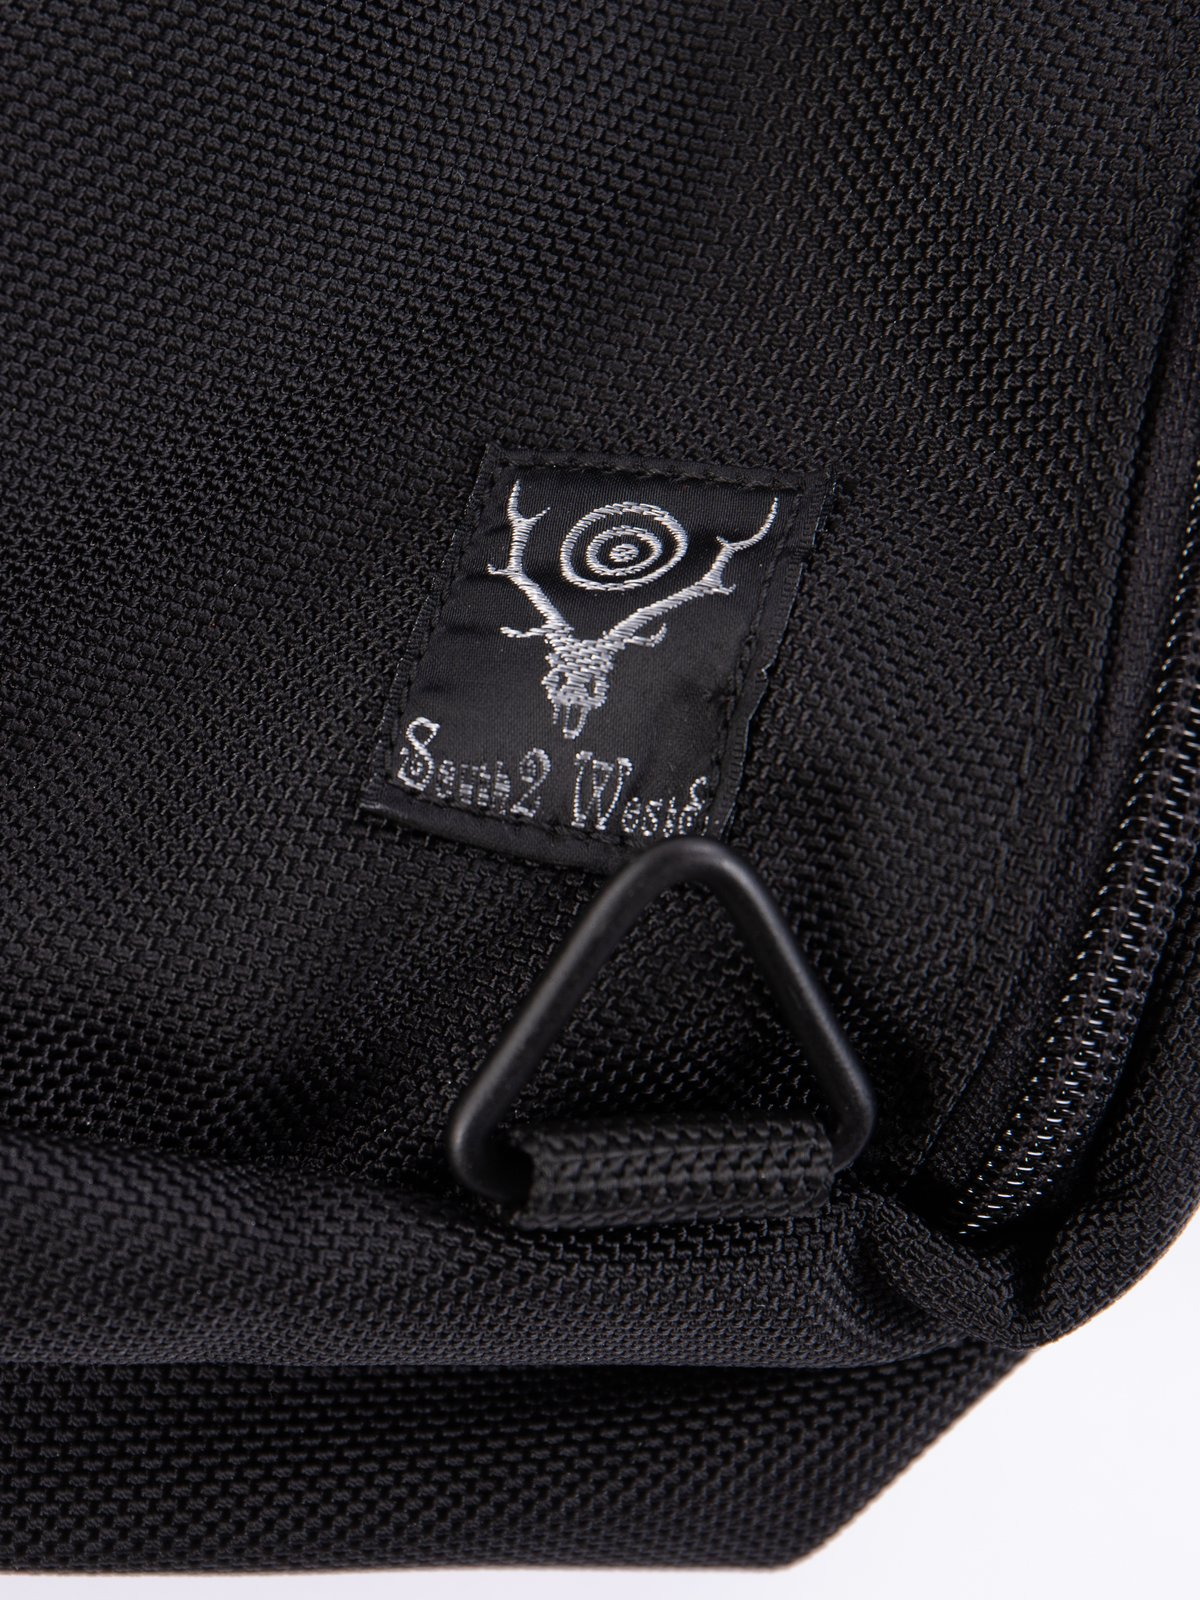 Black Ballistic Nylon Hunter's Field Bag - Image 2